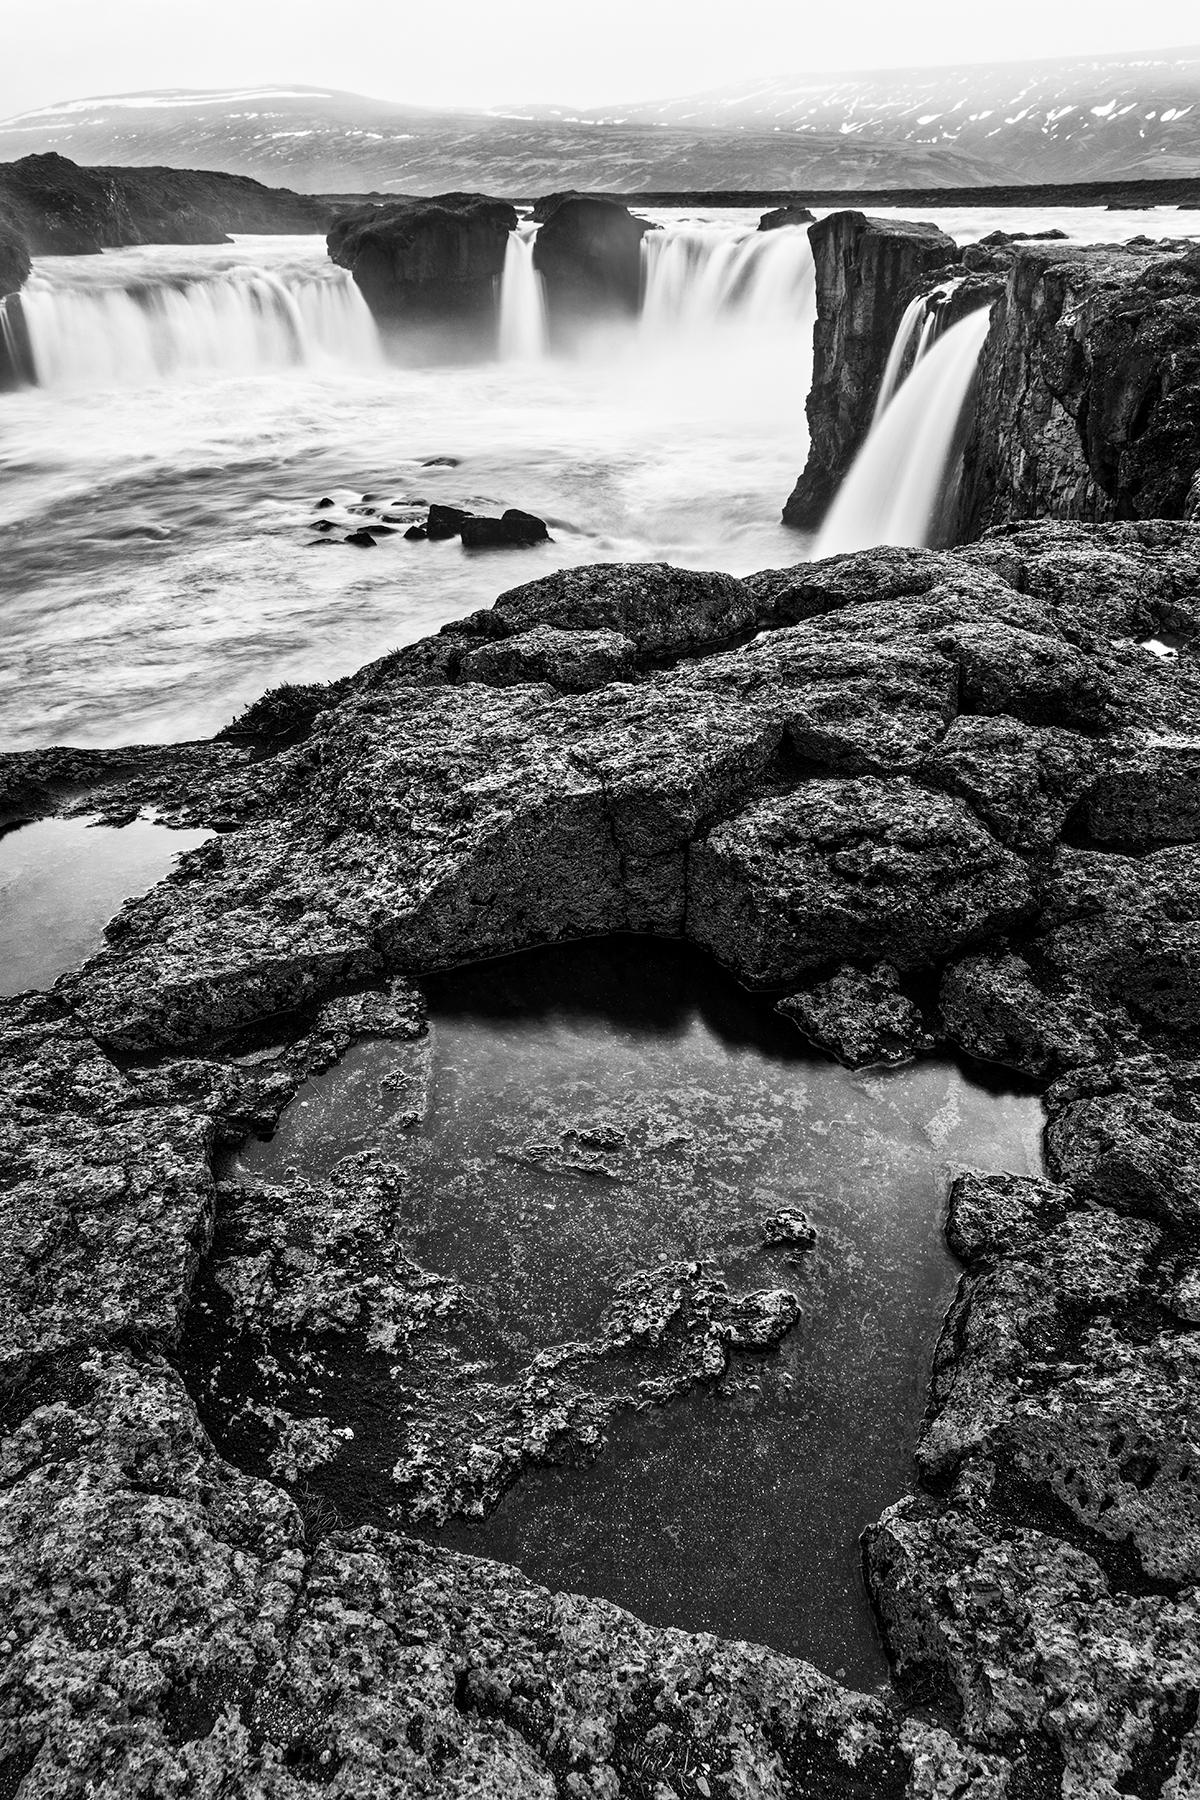 Loki falls - black & white photo